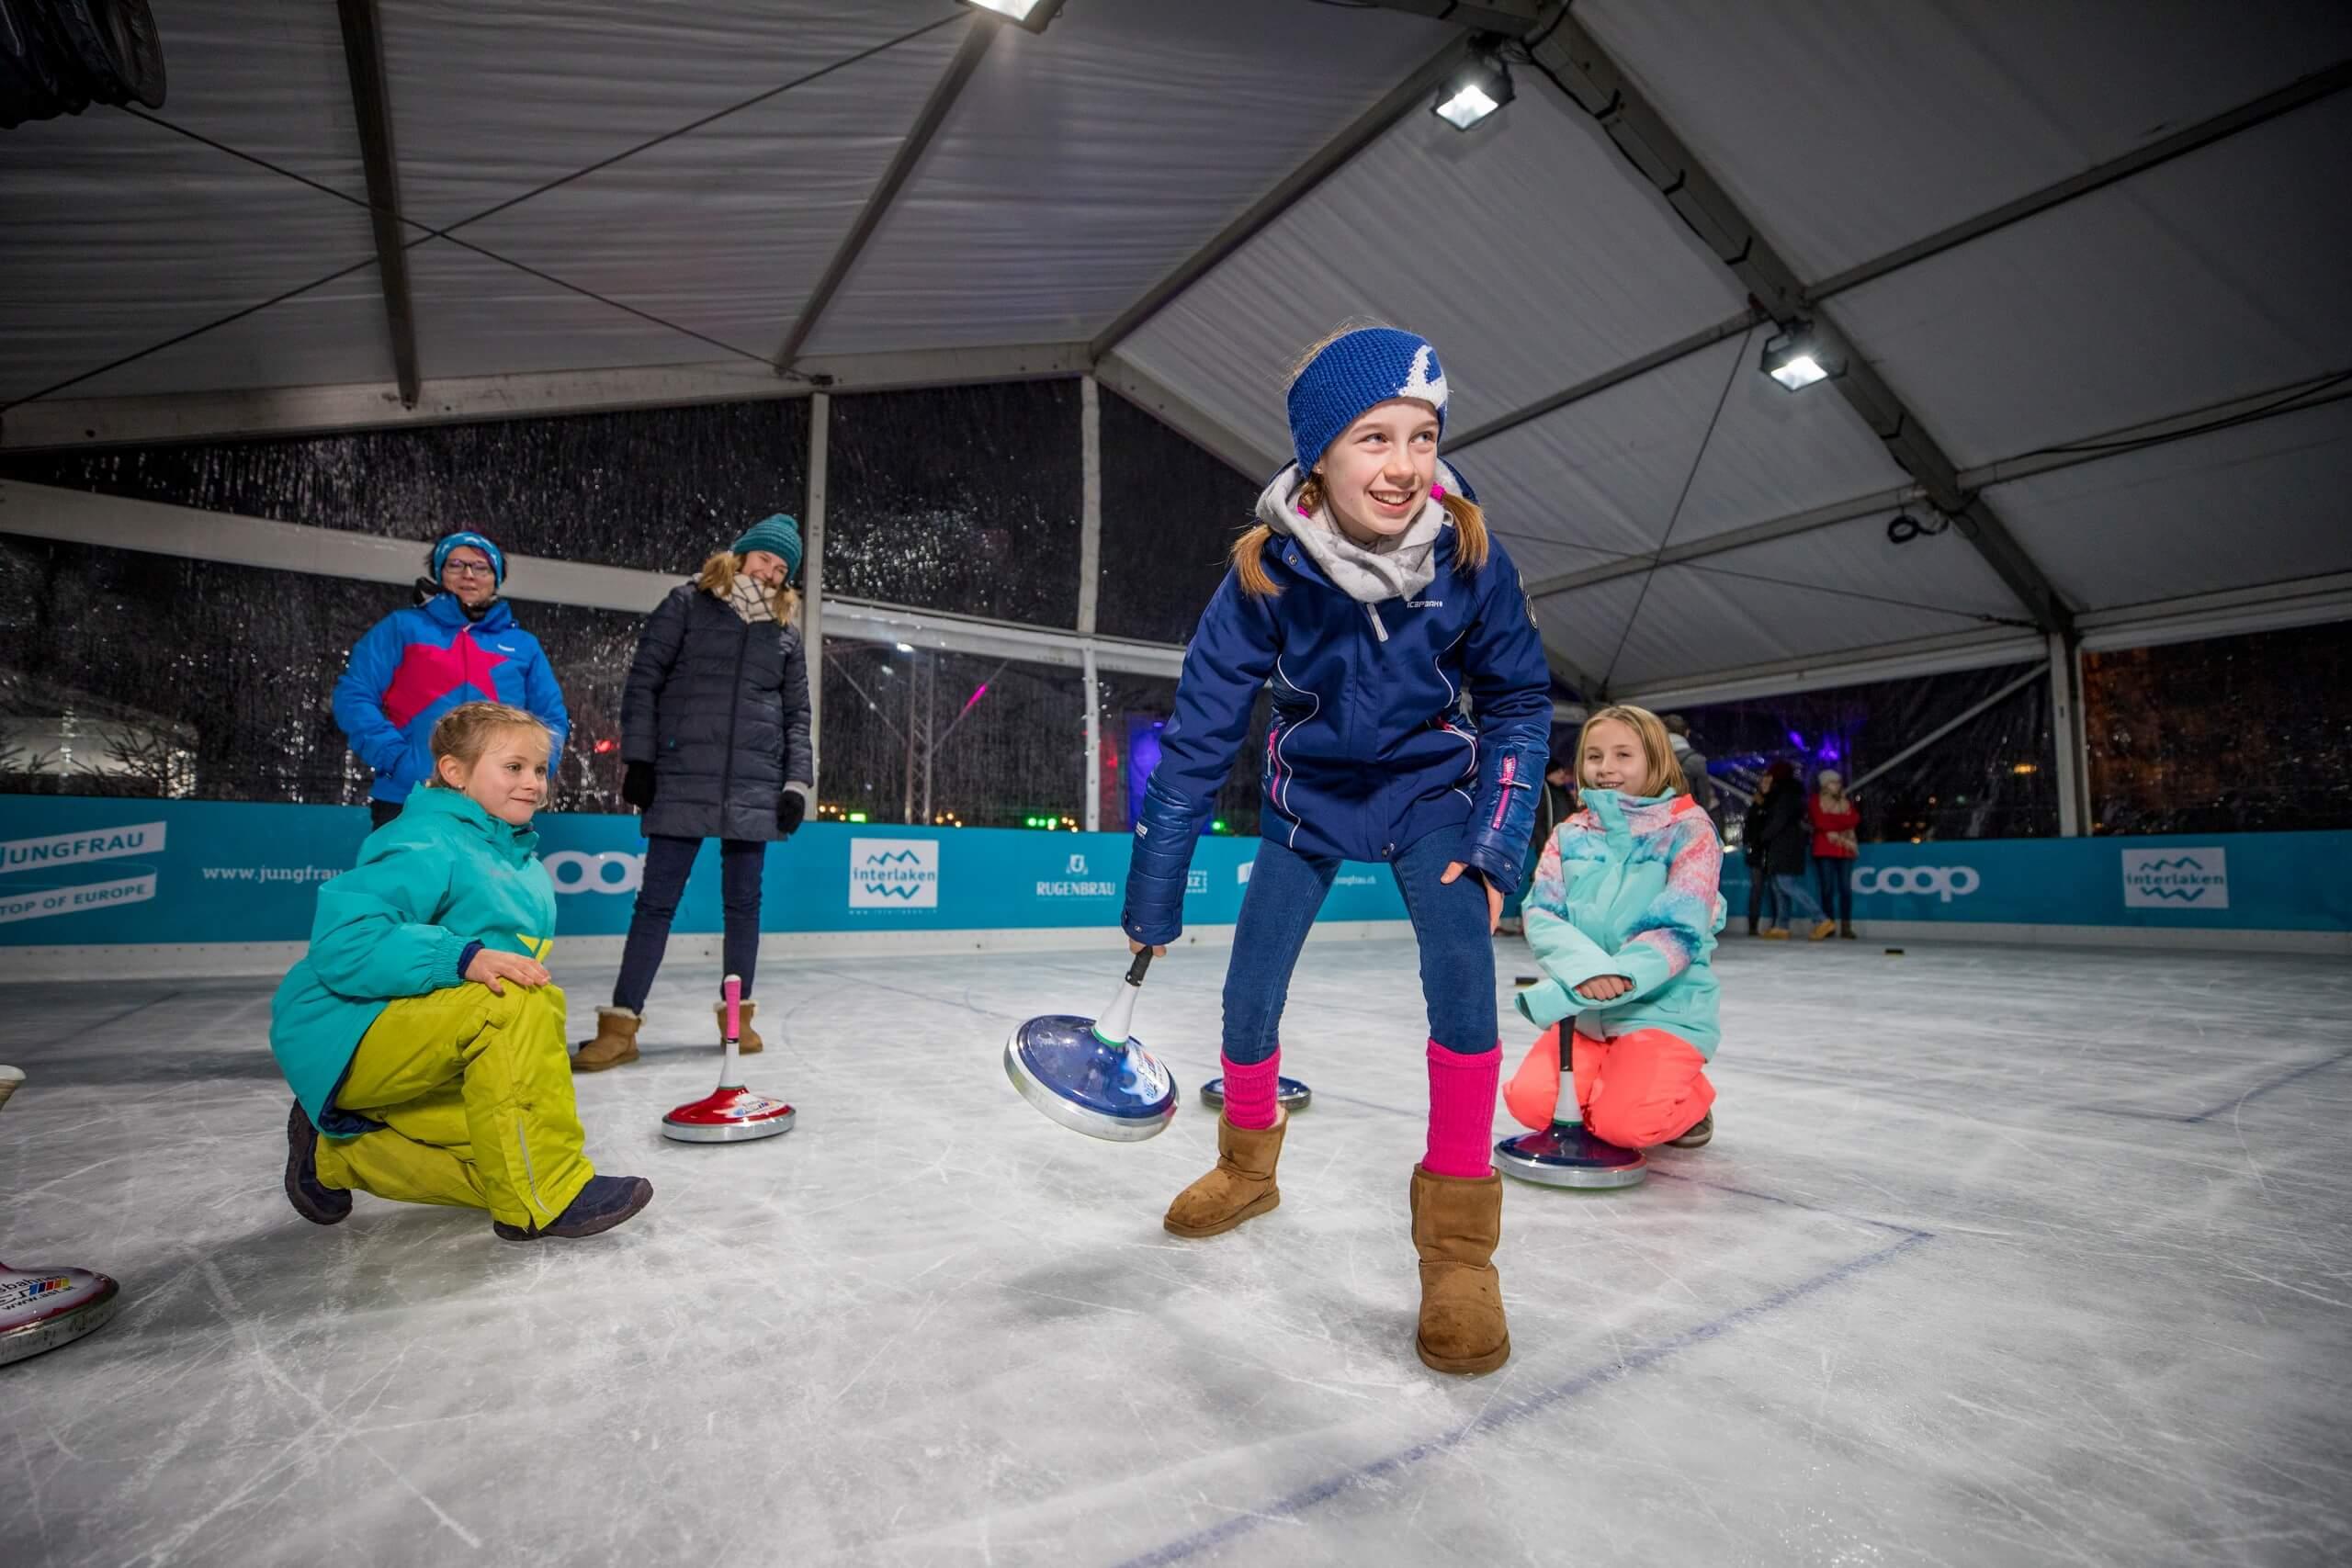 top-of-europe-ice-magic-interlaken-eisstockschiessen-winter-wintersport-familie.jpg